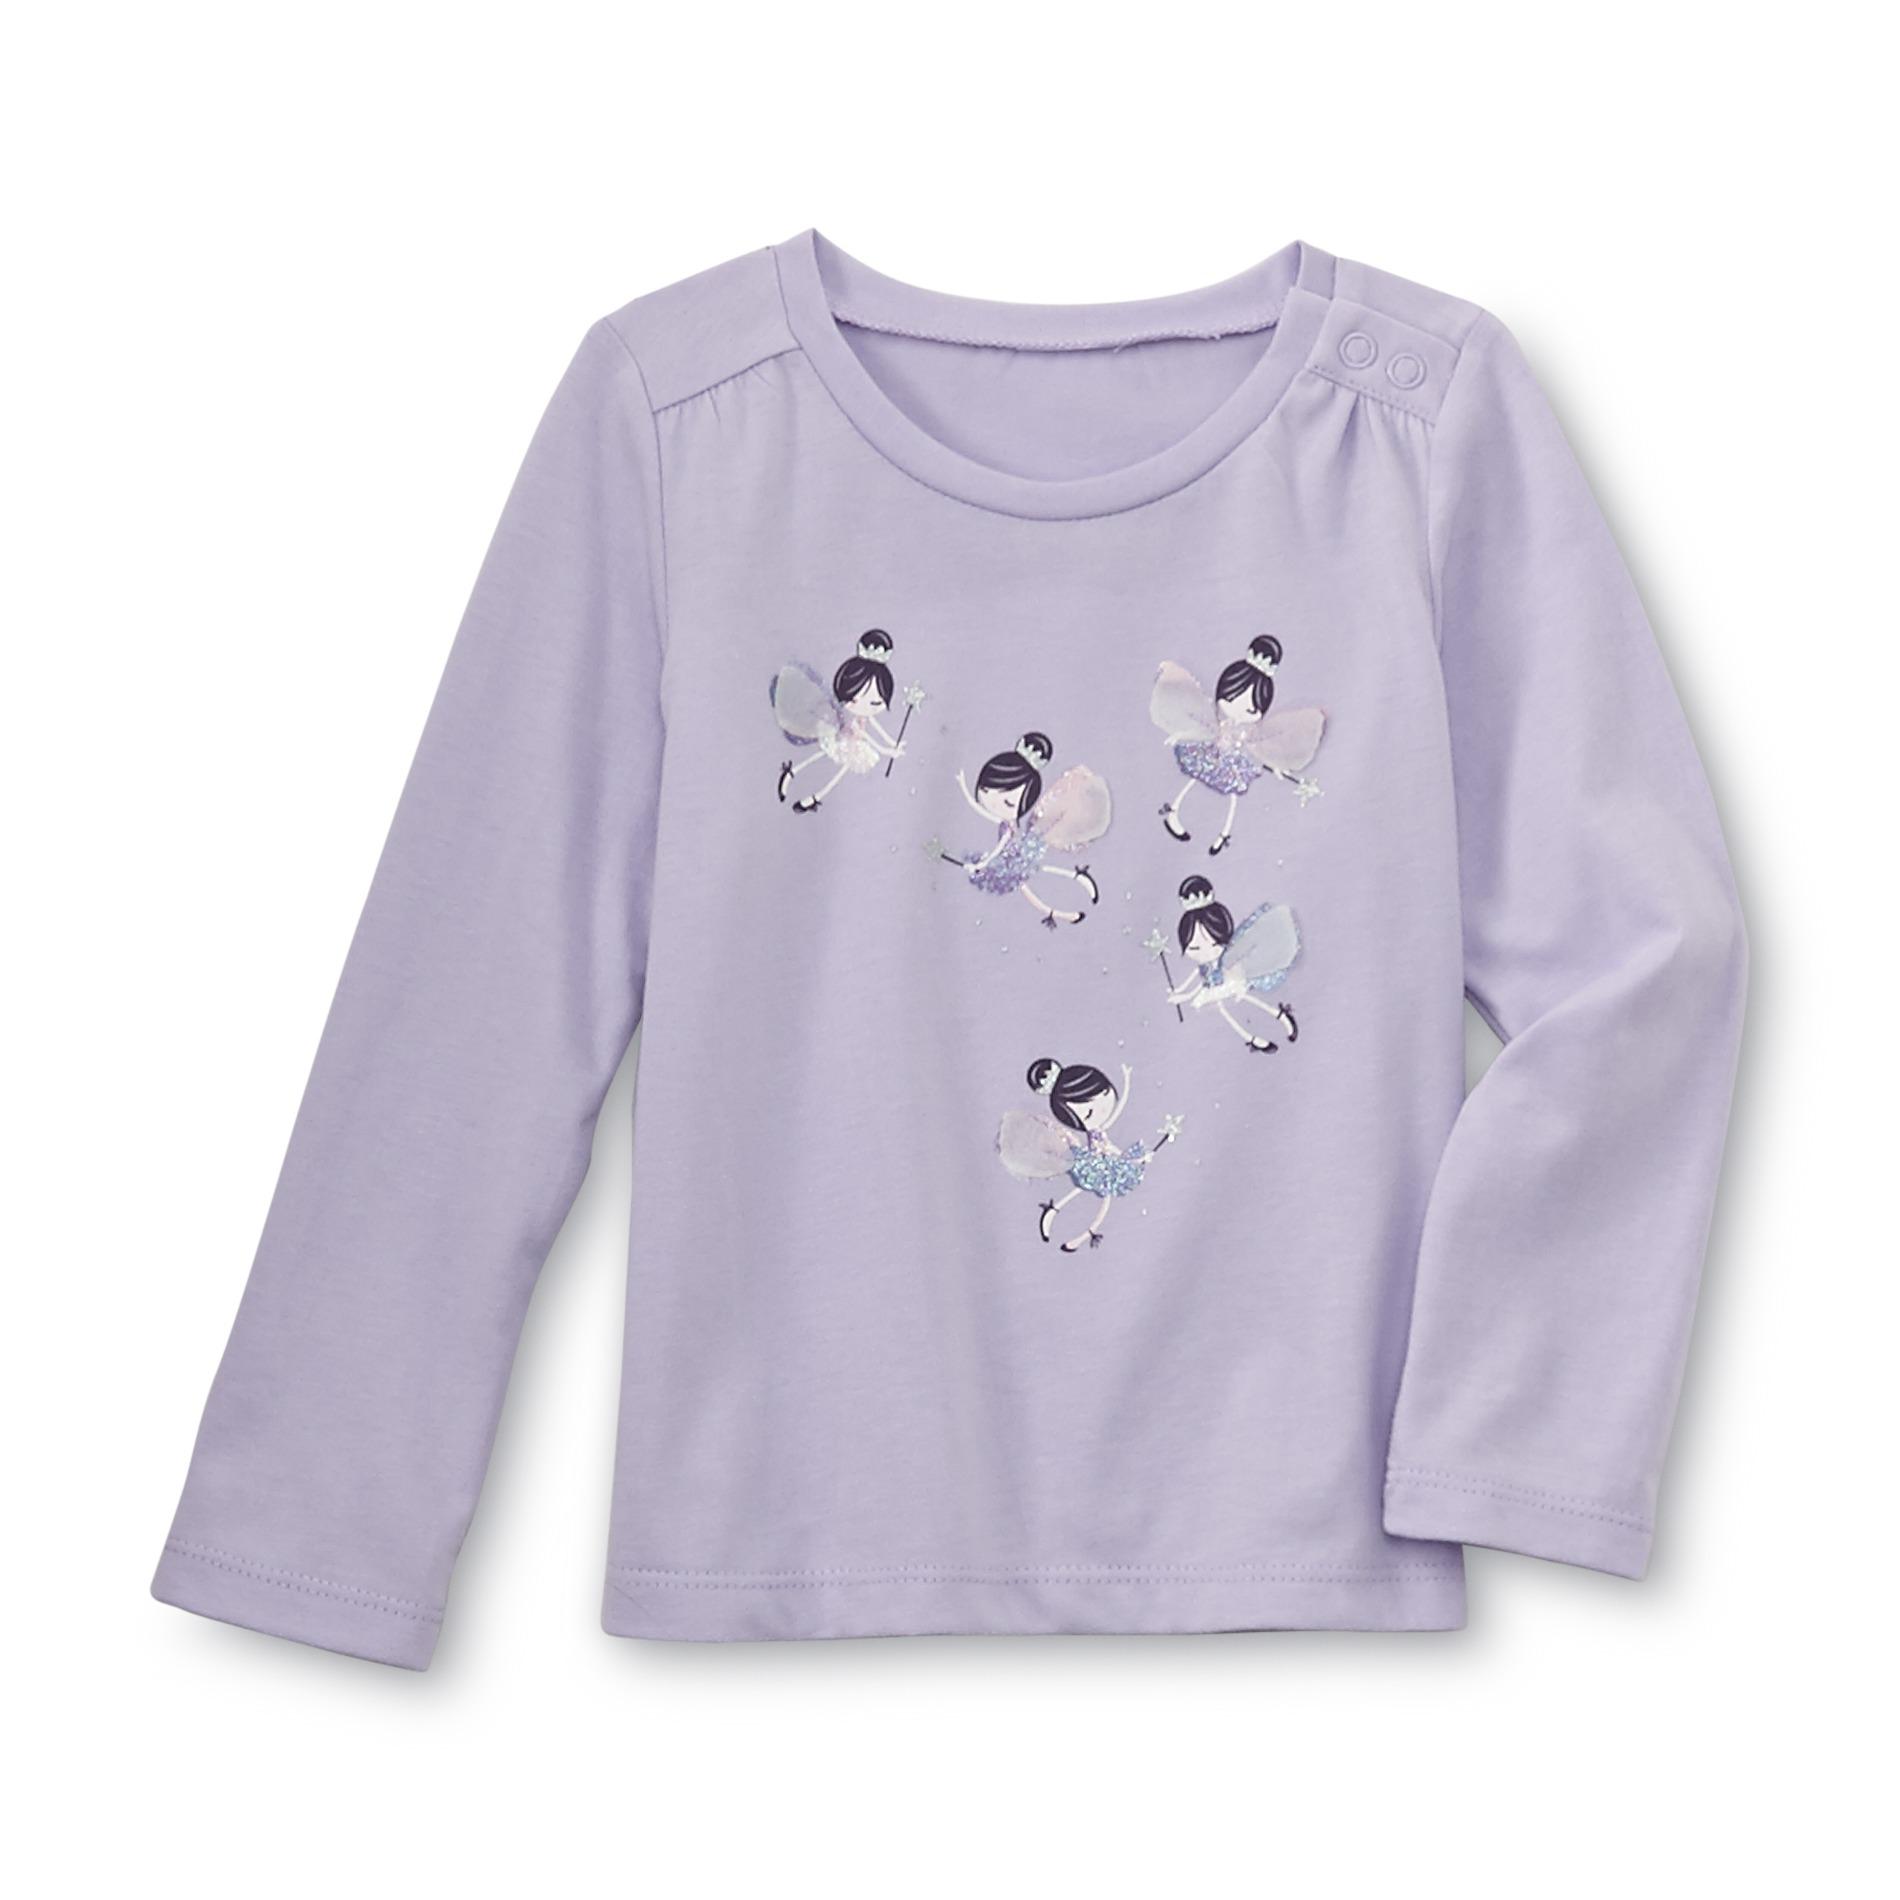 Toughskins Infant & Toddler Girl's Long-Sleeve T-Shirt - Fairies